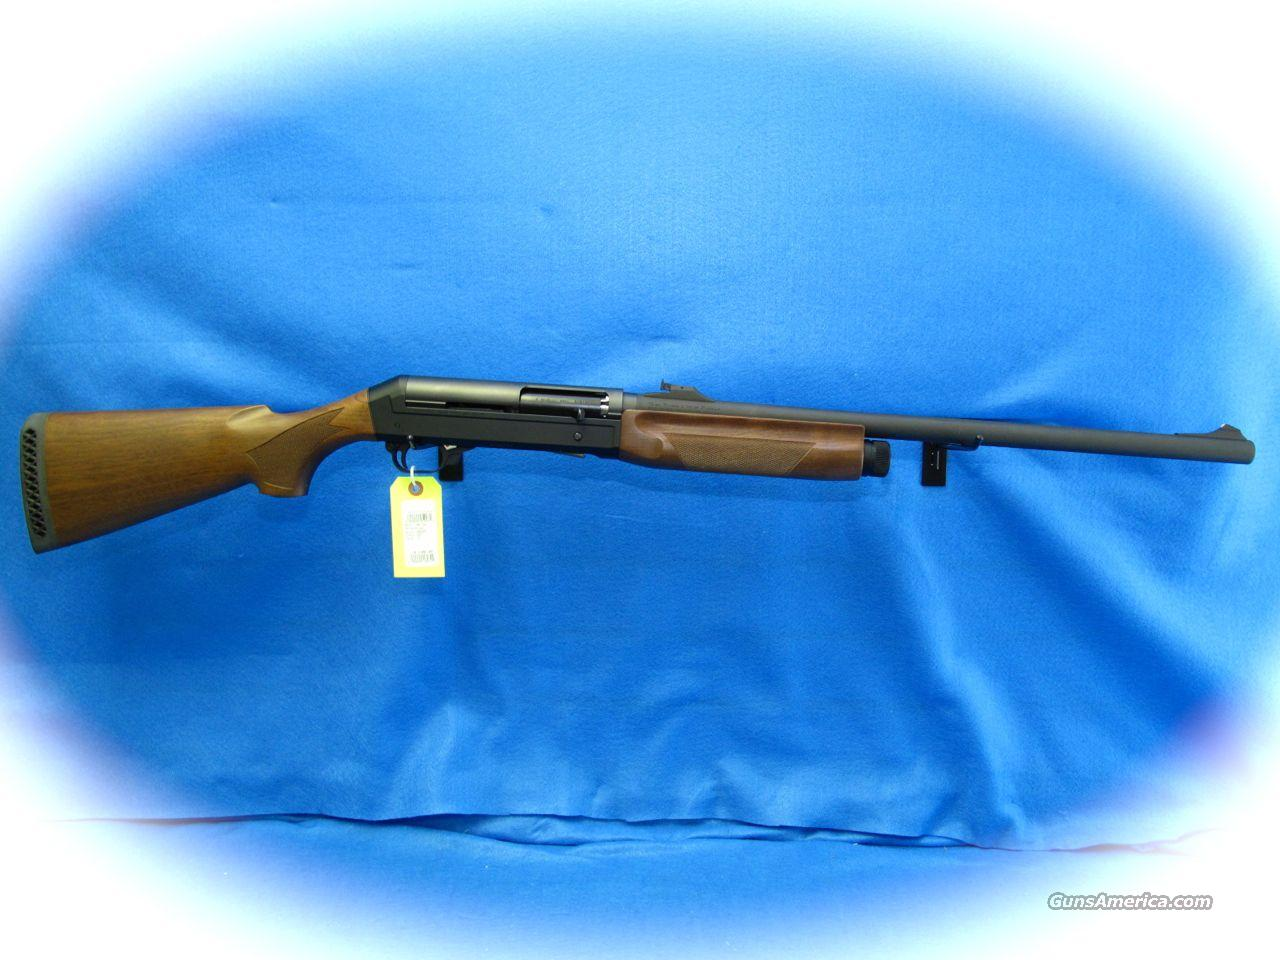 Rifled slug gun used guns gt shotguns gt benelli shotguns gt sporting